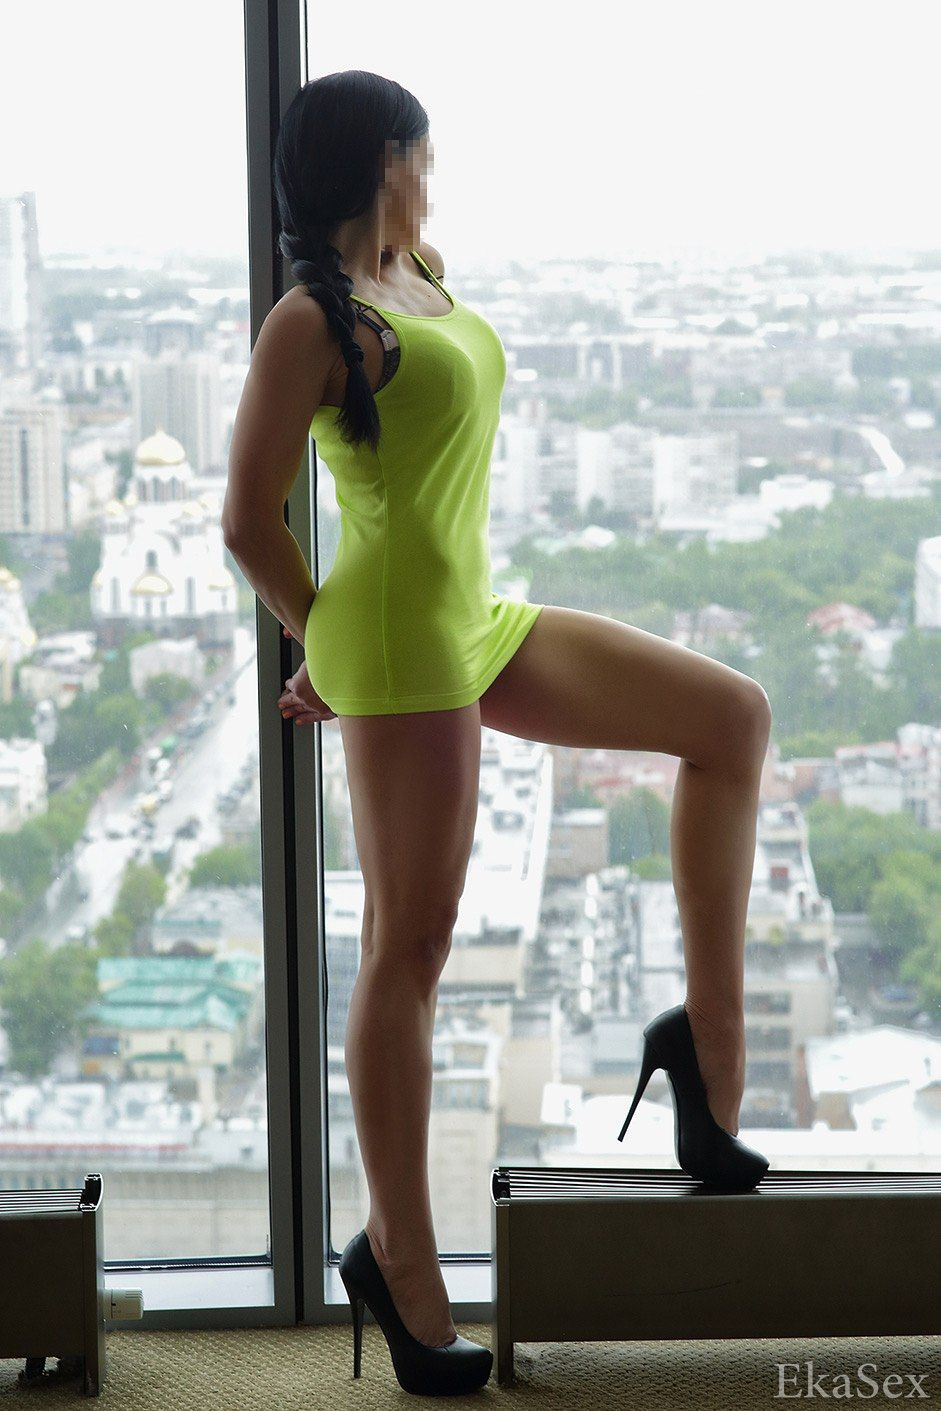 koroleva-ekaterinburg-prostitutka-video-vlaga-vnutri-devushki-krupnim-planom